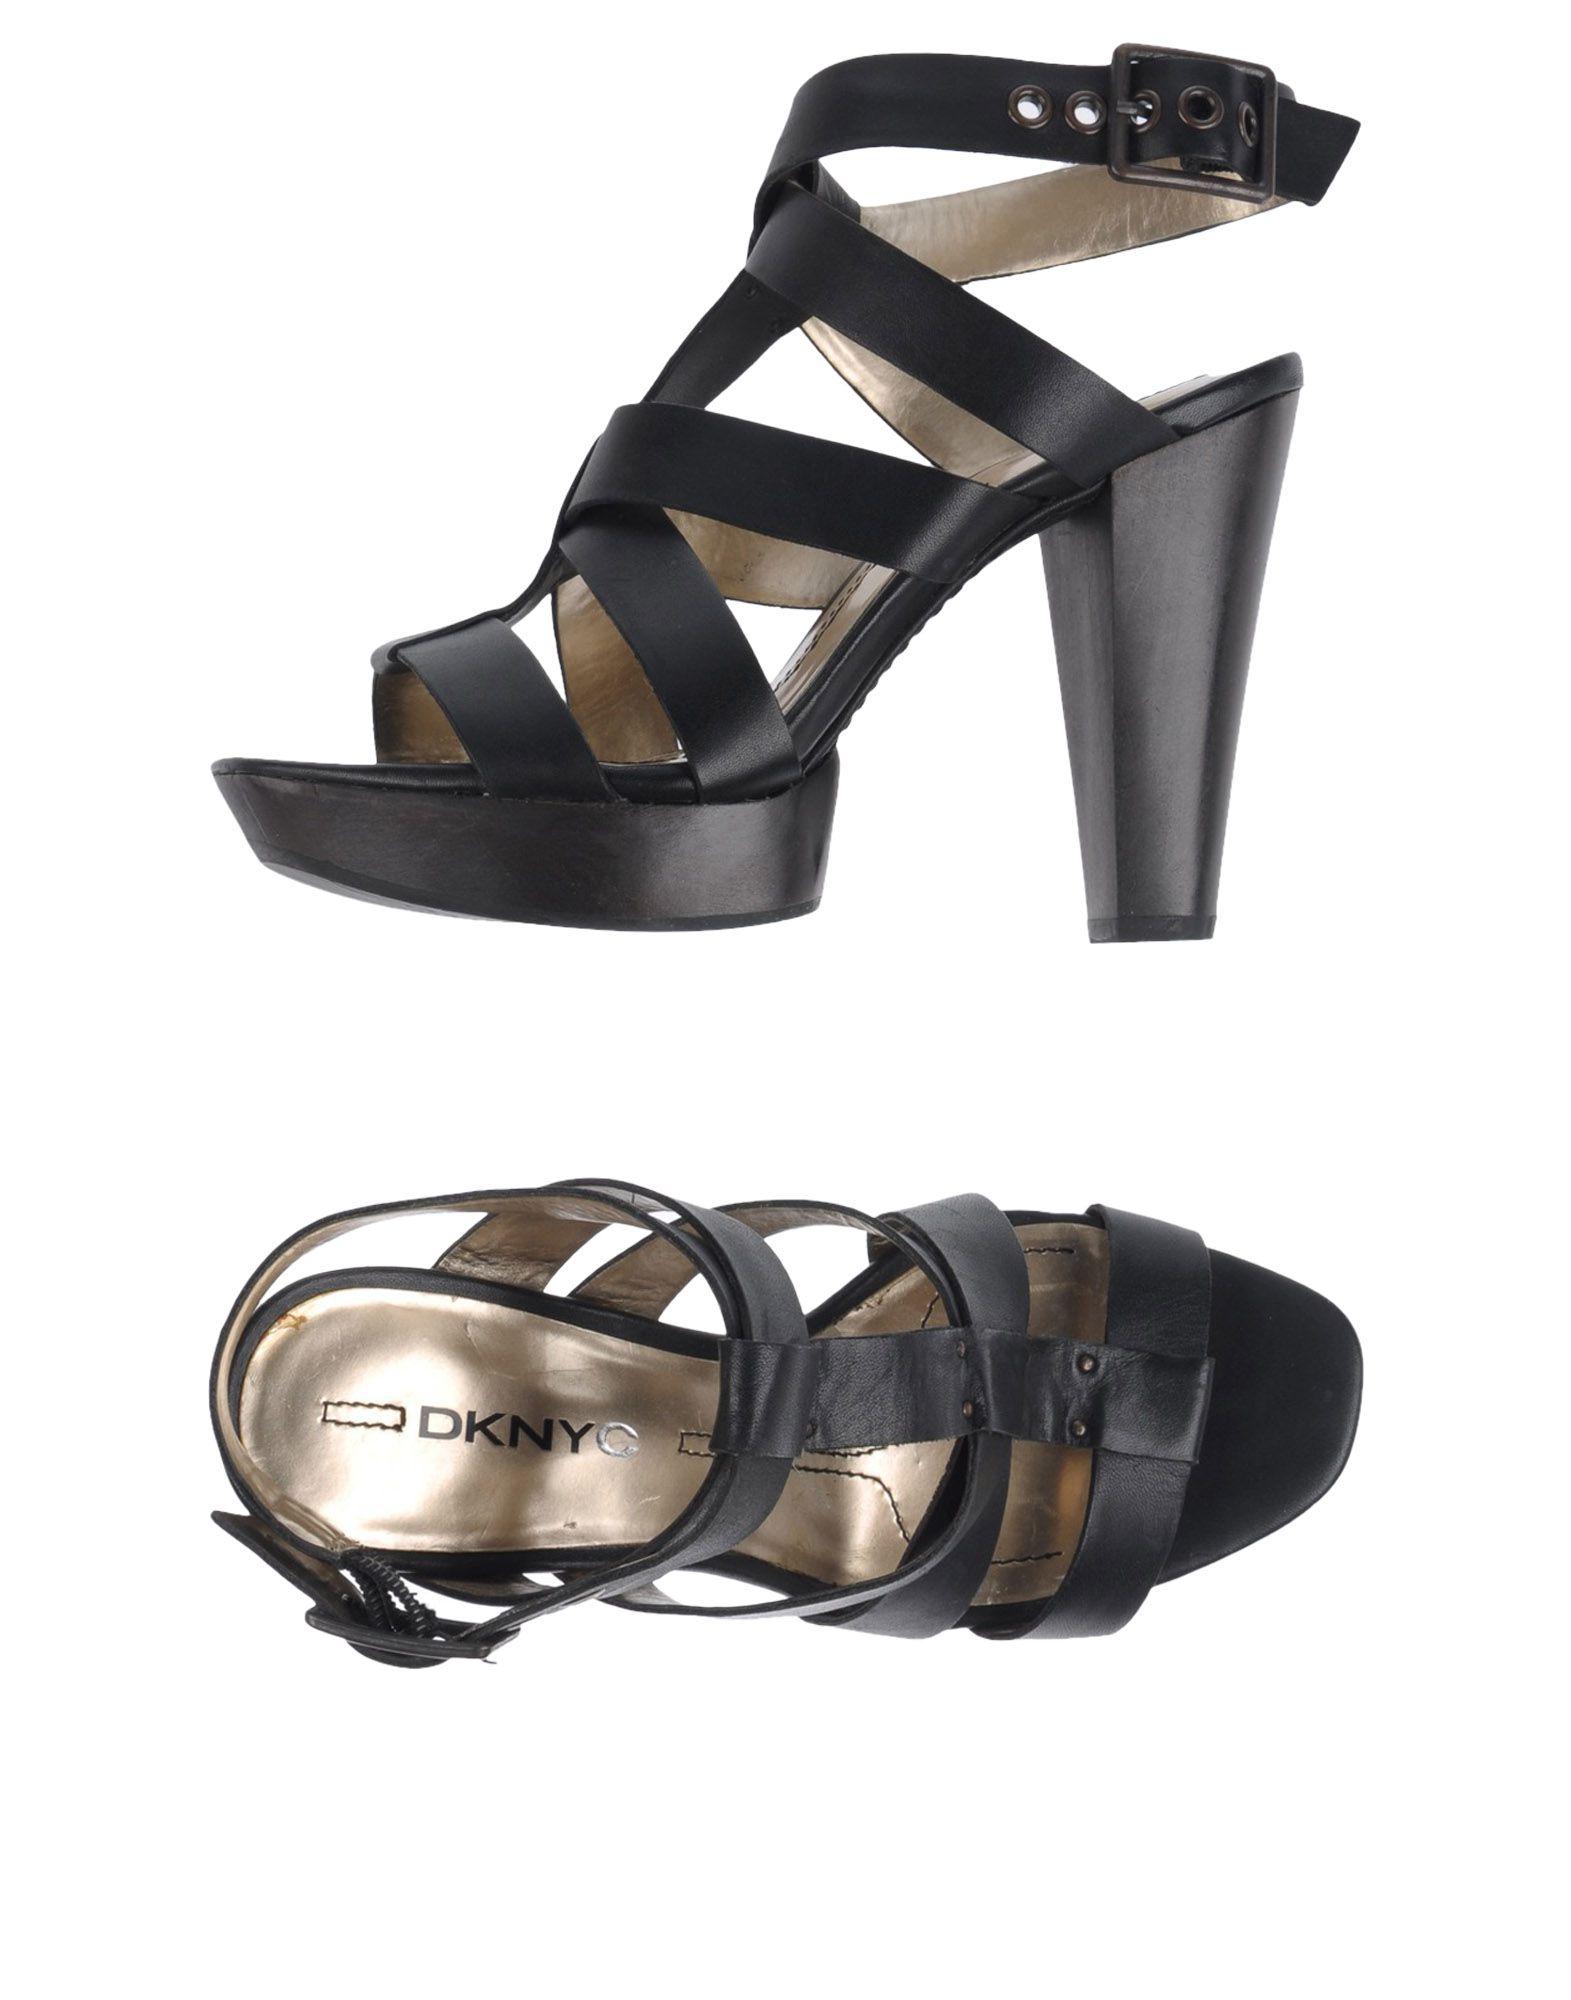 dkny sandals shop at ebates